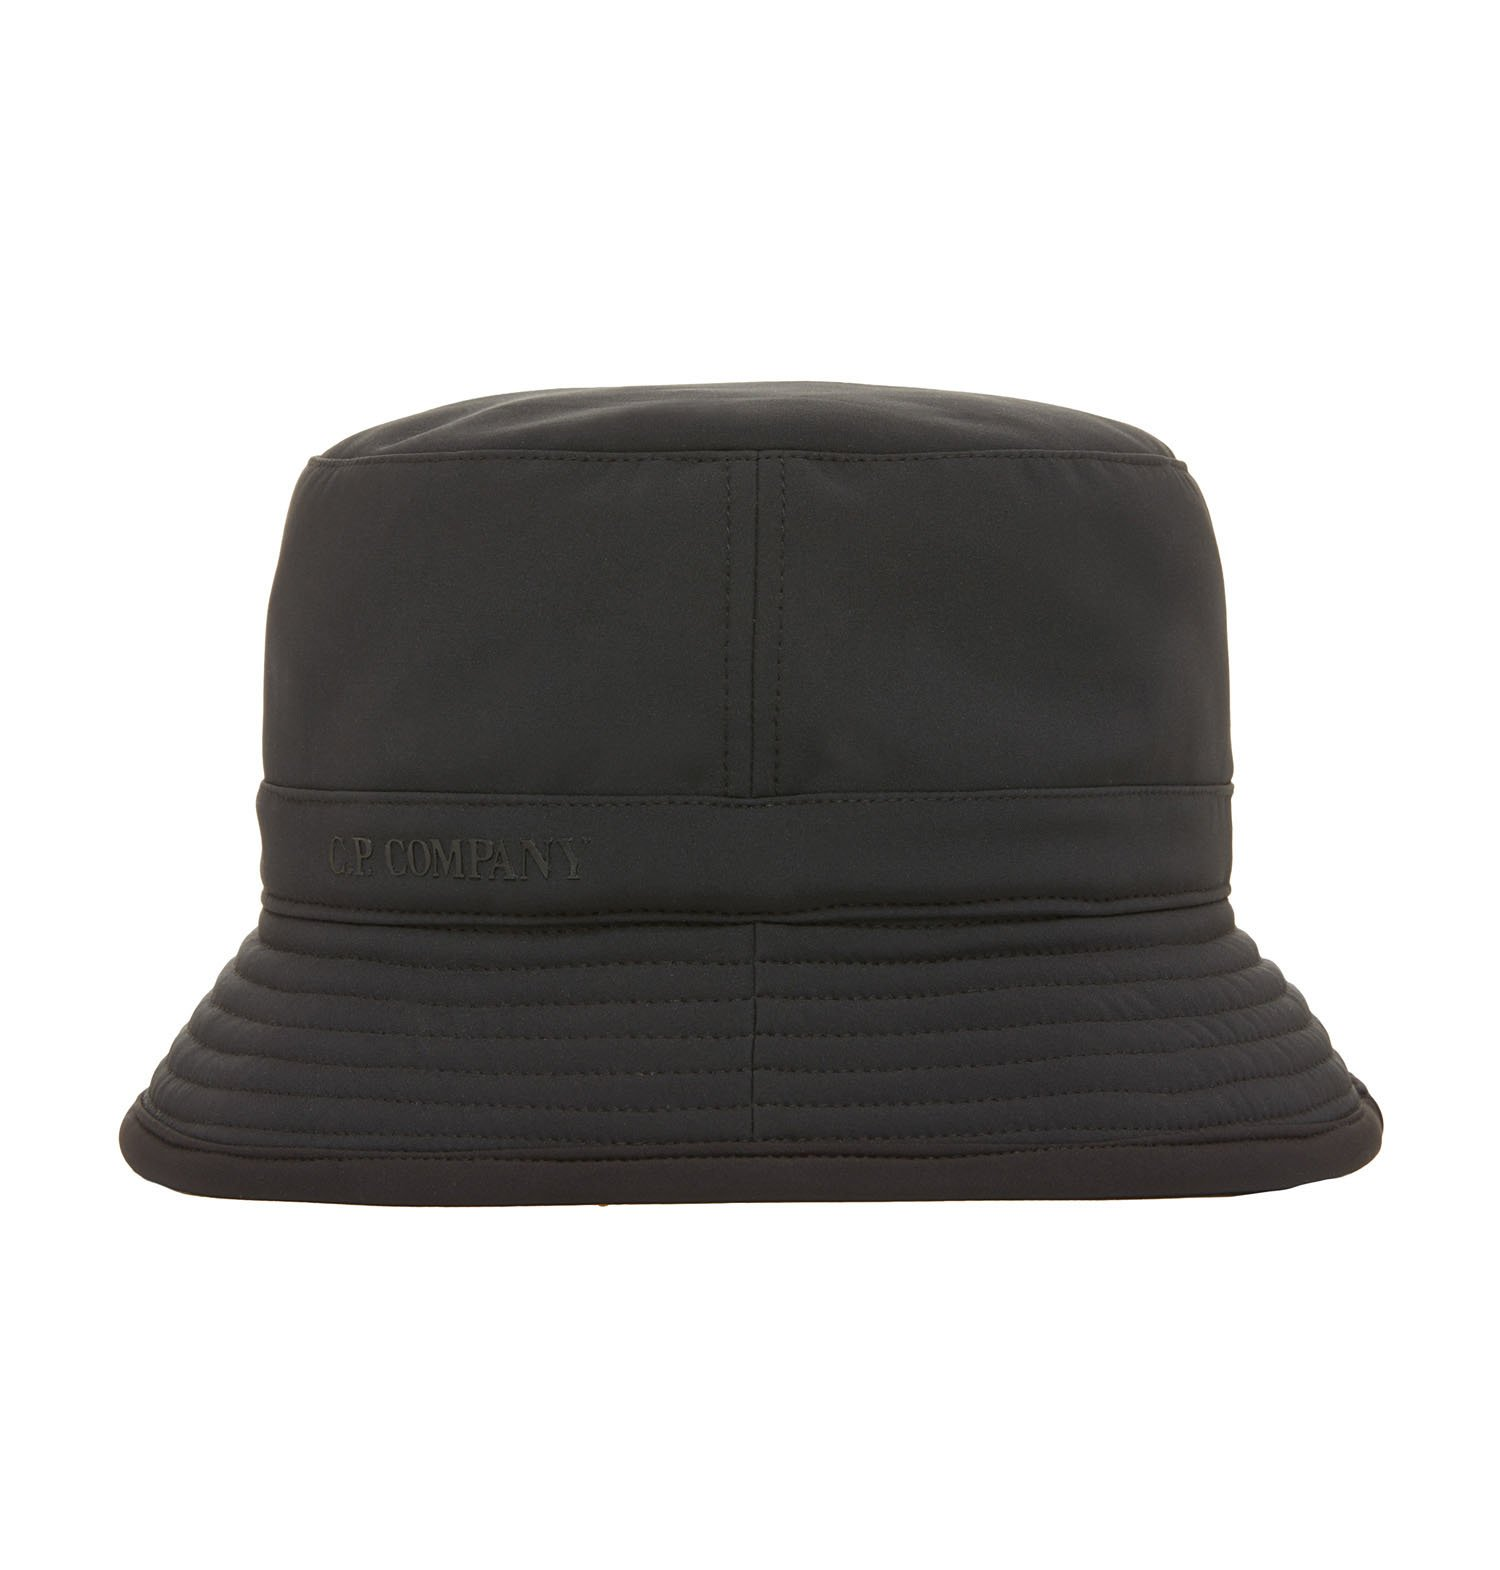 17160ca2aff C.p. Soft Shell Bucket Hat